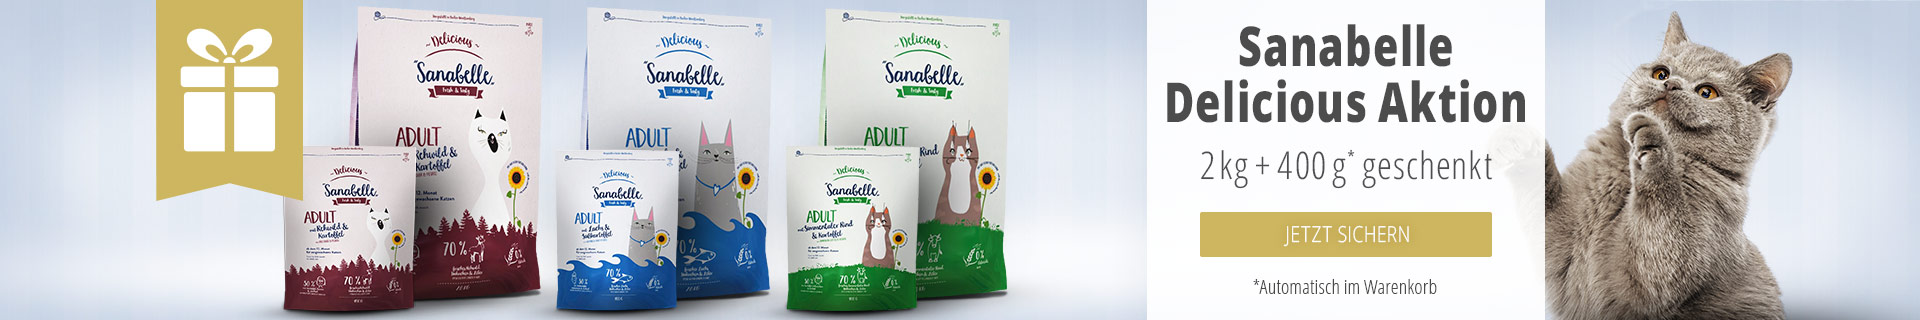 Sanabelle Delicious Aktion 2kg + 400g geschenkt